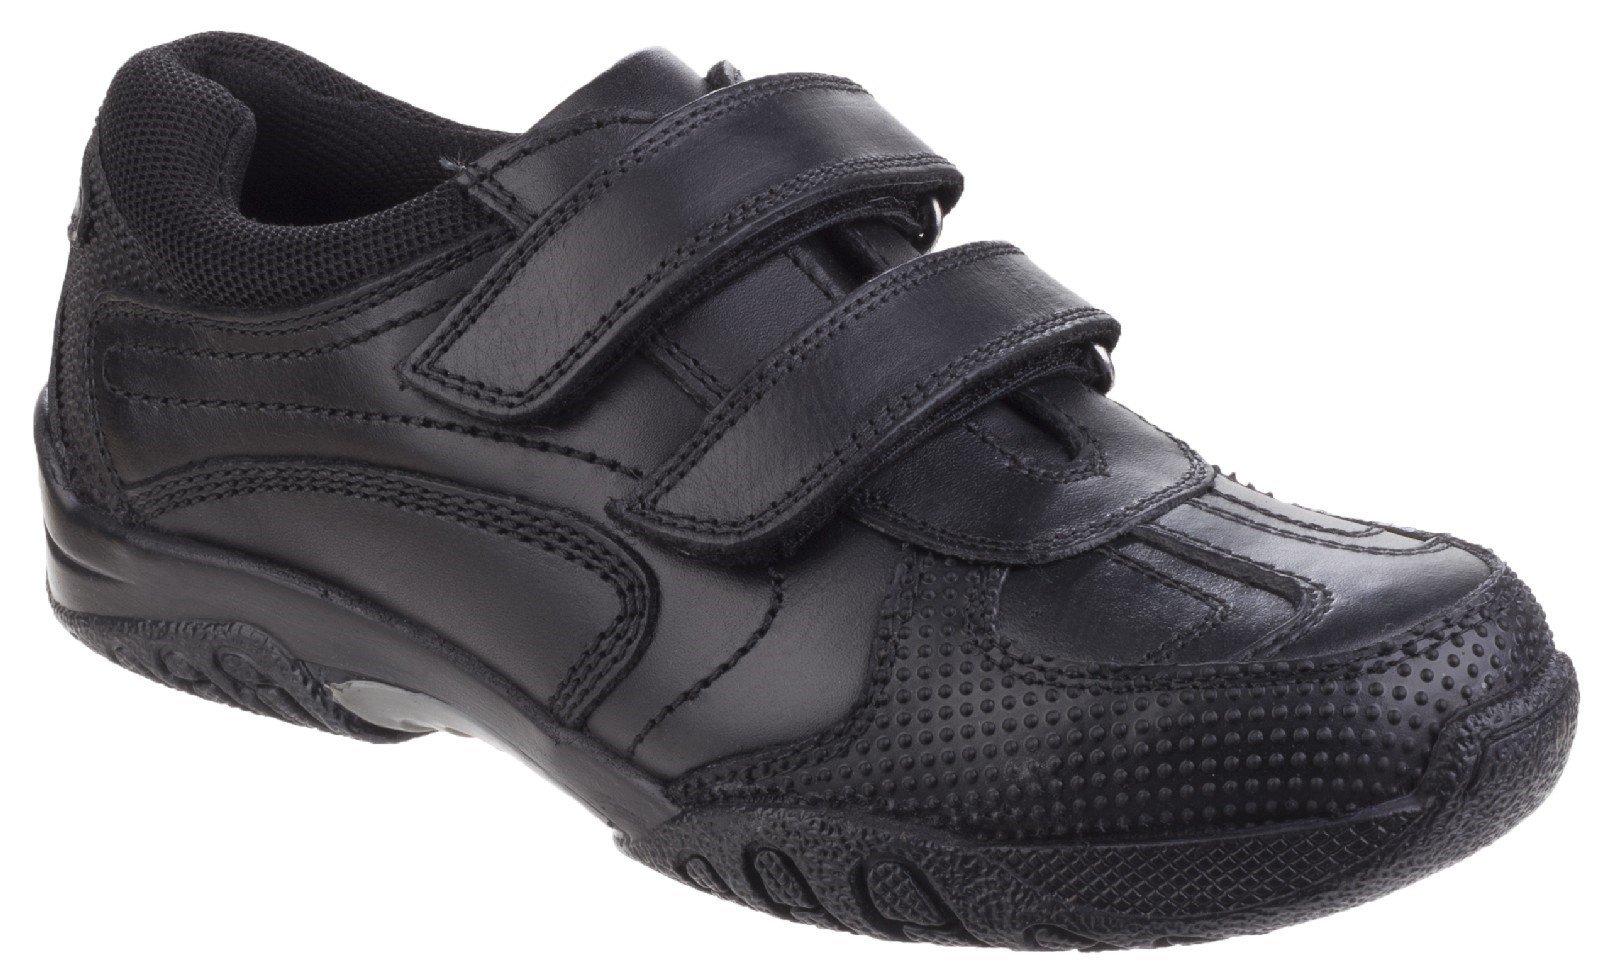 Hush Puppies Women's Jezza Back To School Shoe Black 25343 - Black 3